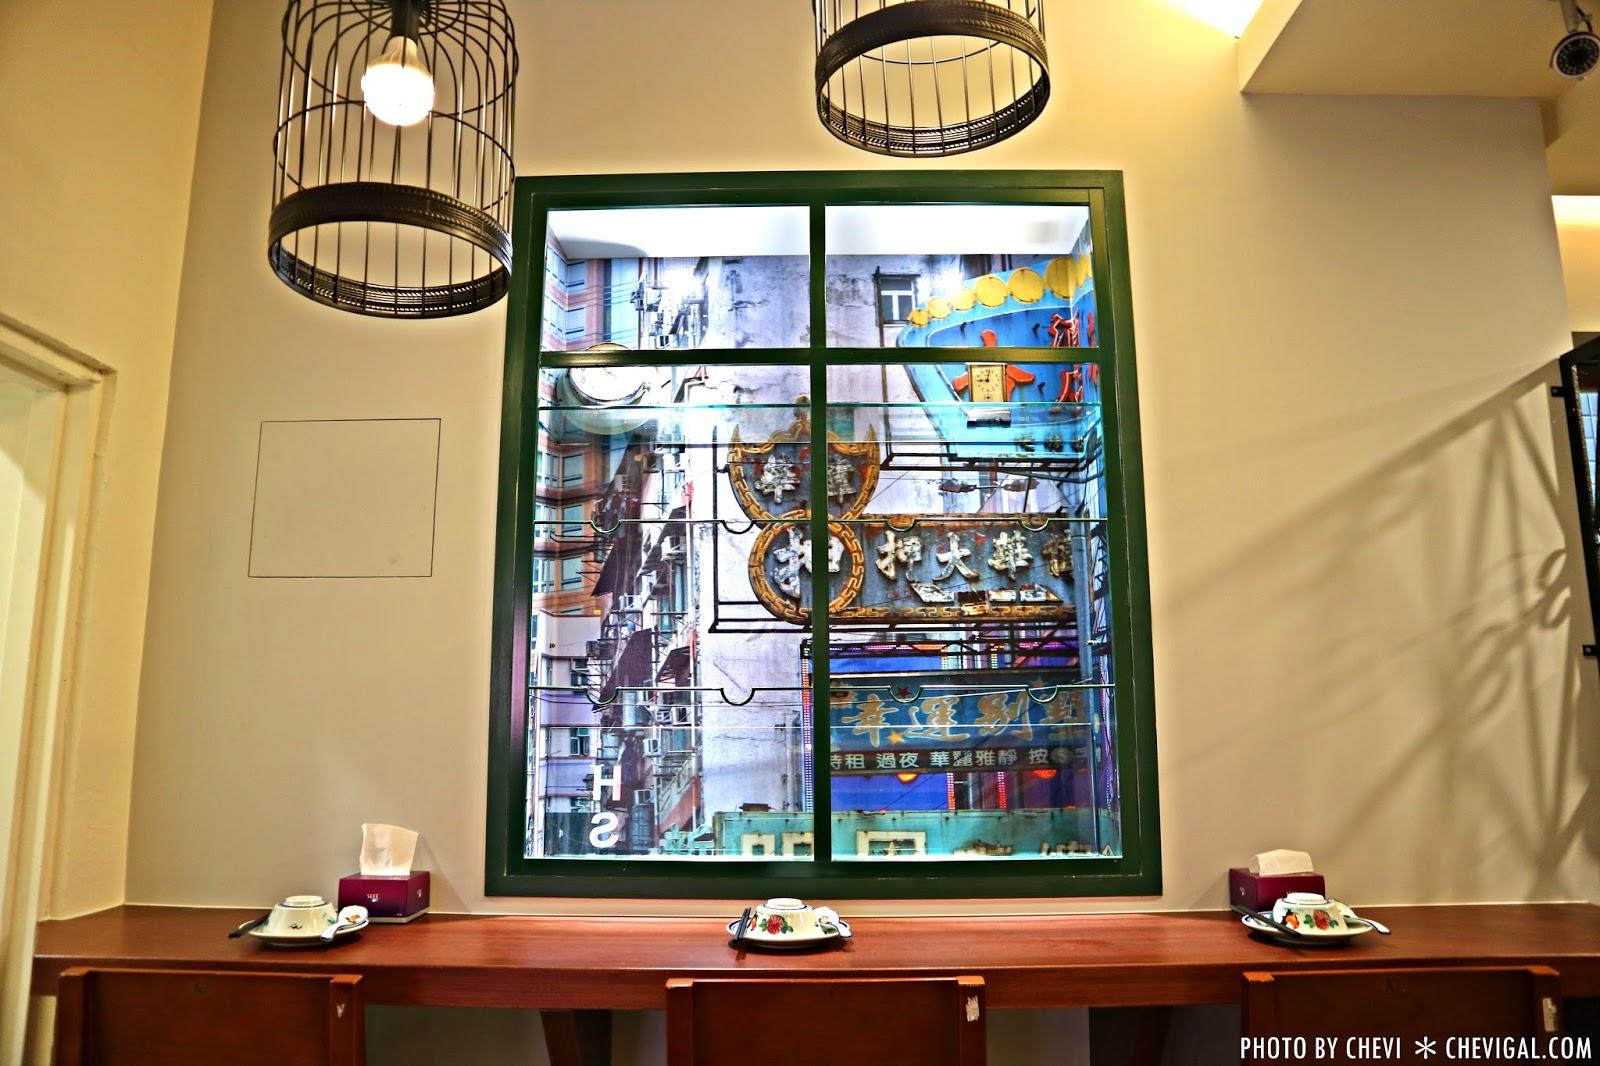 IMG 9119 - 台中西屯│帥鍋冰室*台中第一間香港冰室新開幕。道地港式餐點風味搬來台灣囉